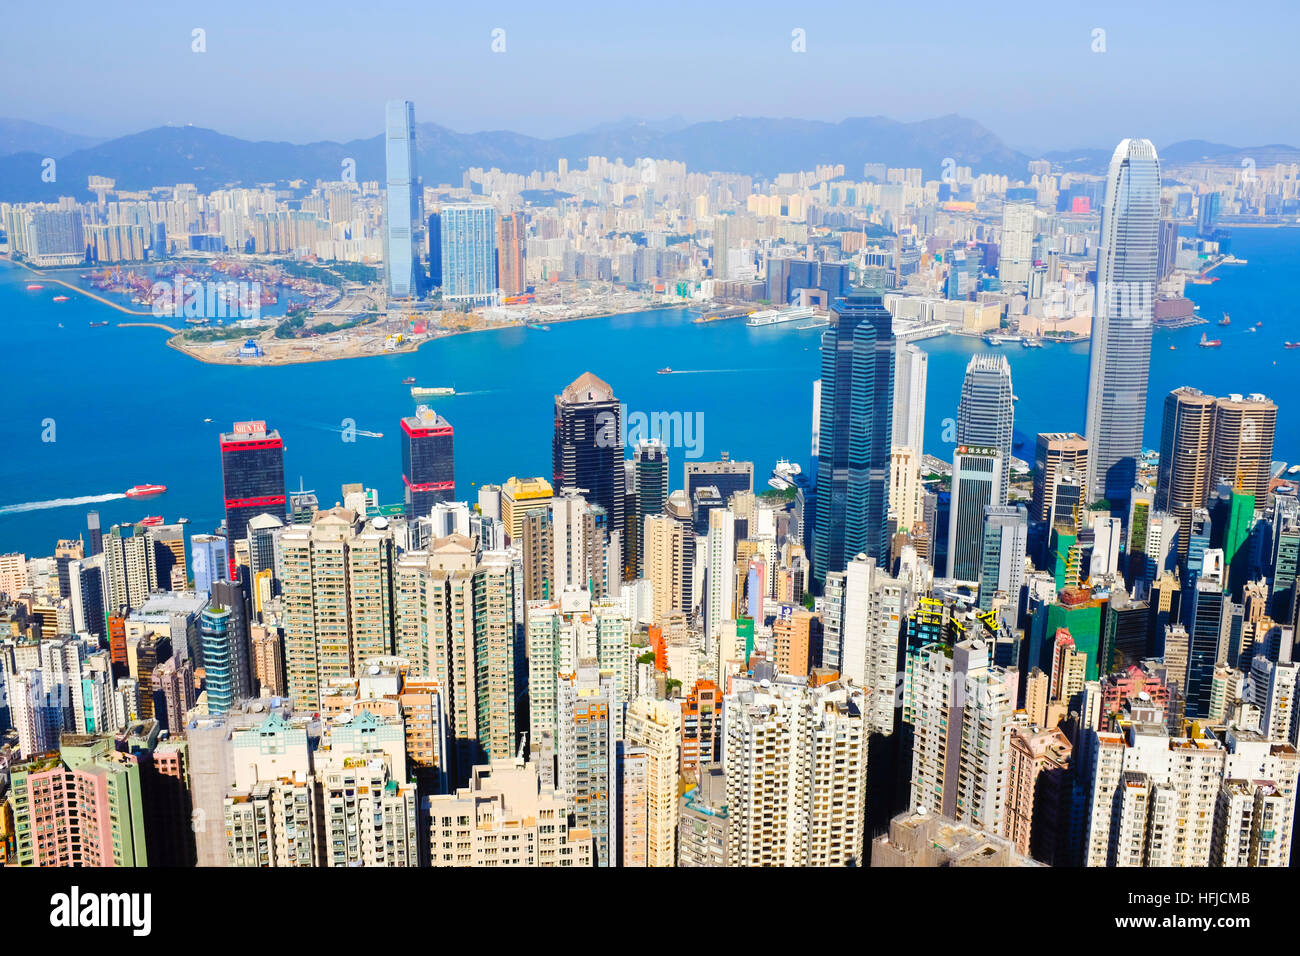 Hong Kong Skyline, Hong Kong, Asia. - Stock Image